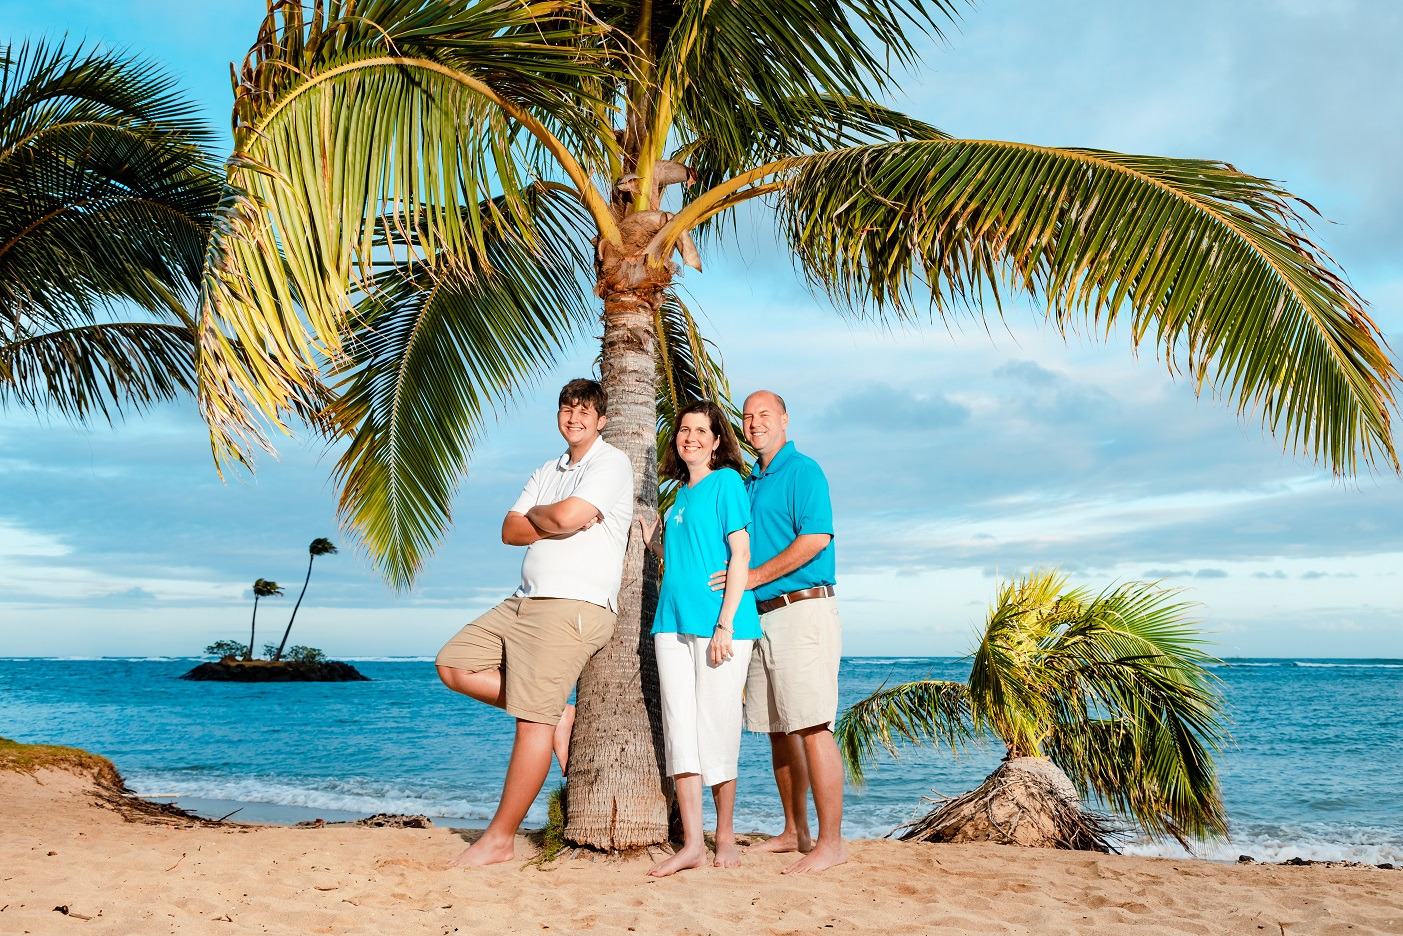 family vacation beach portrait kahala hotel resort oahu hawaii